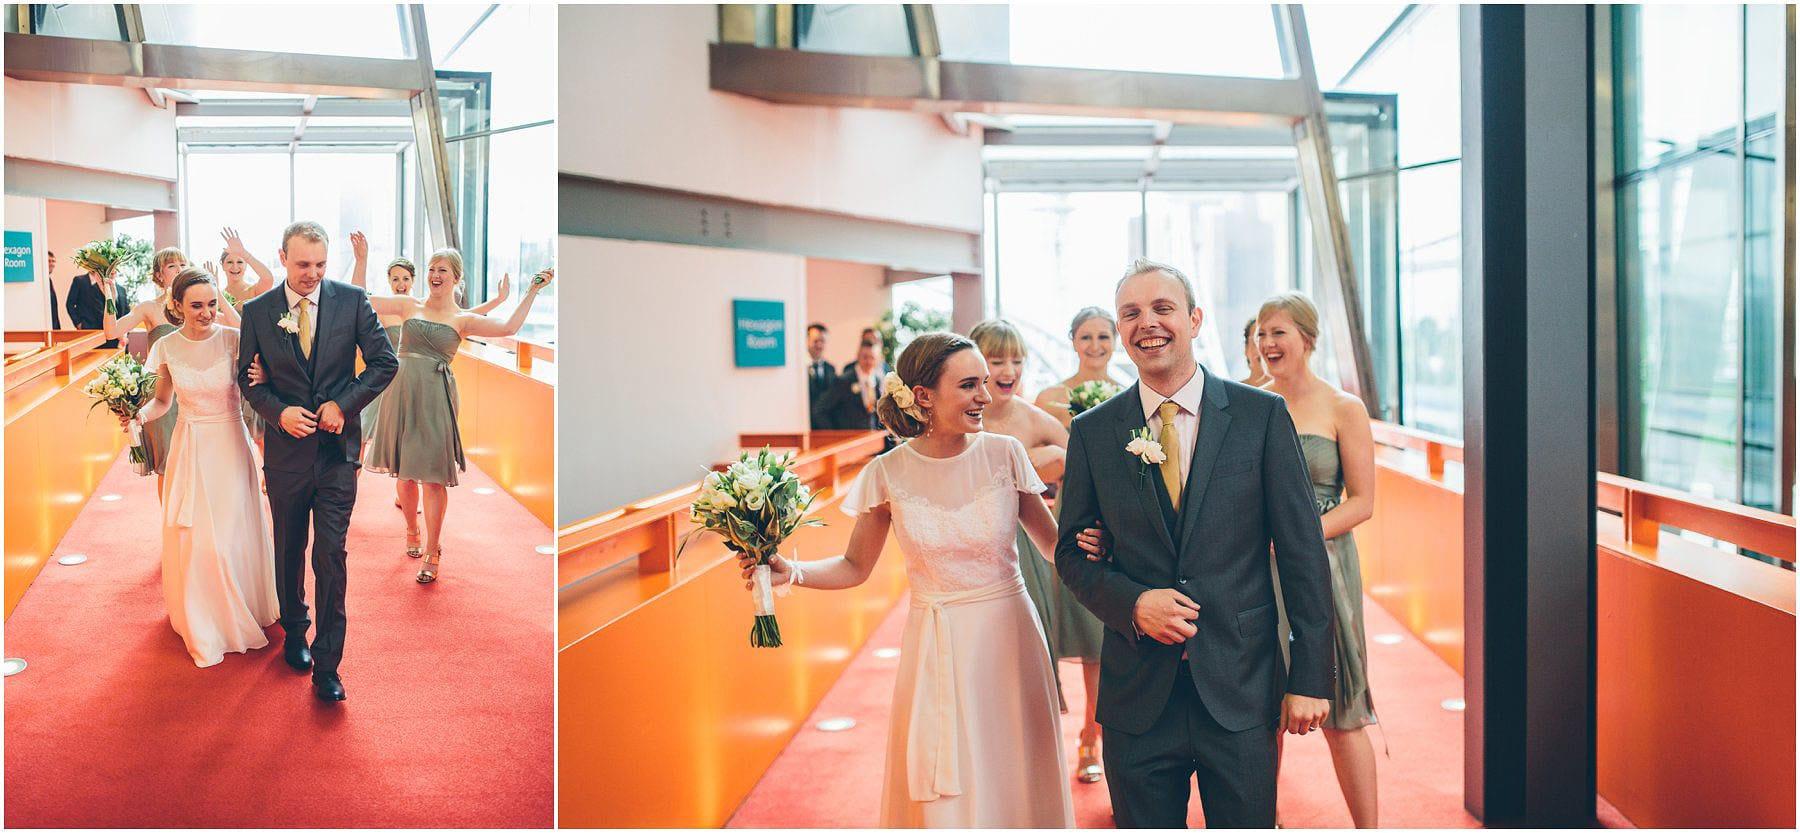 Lowry_Theatre_Wedding_Photography_0059